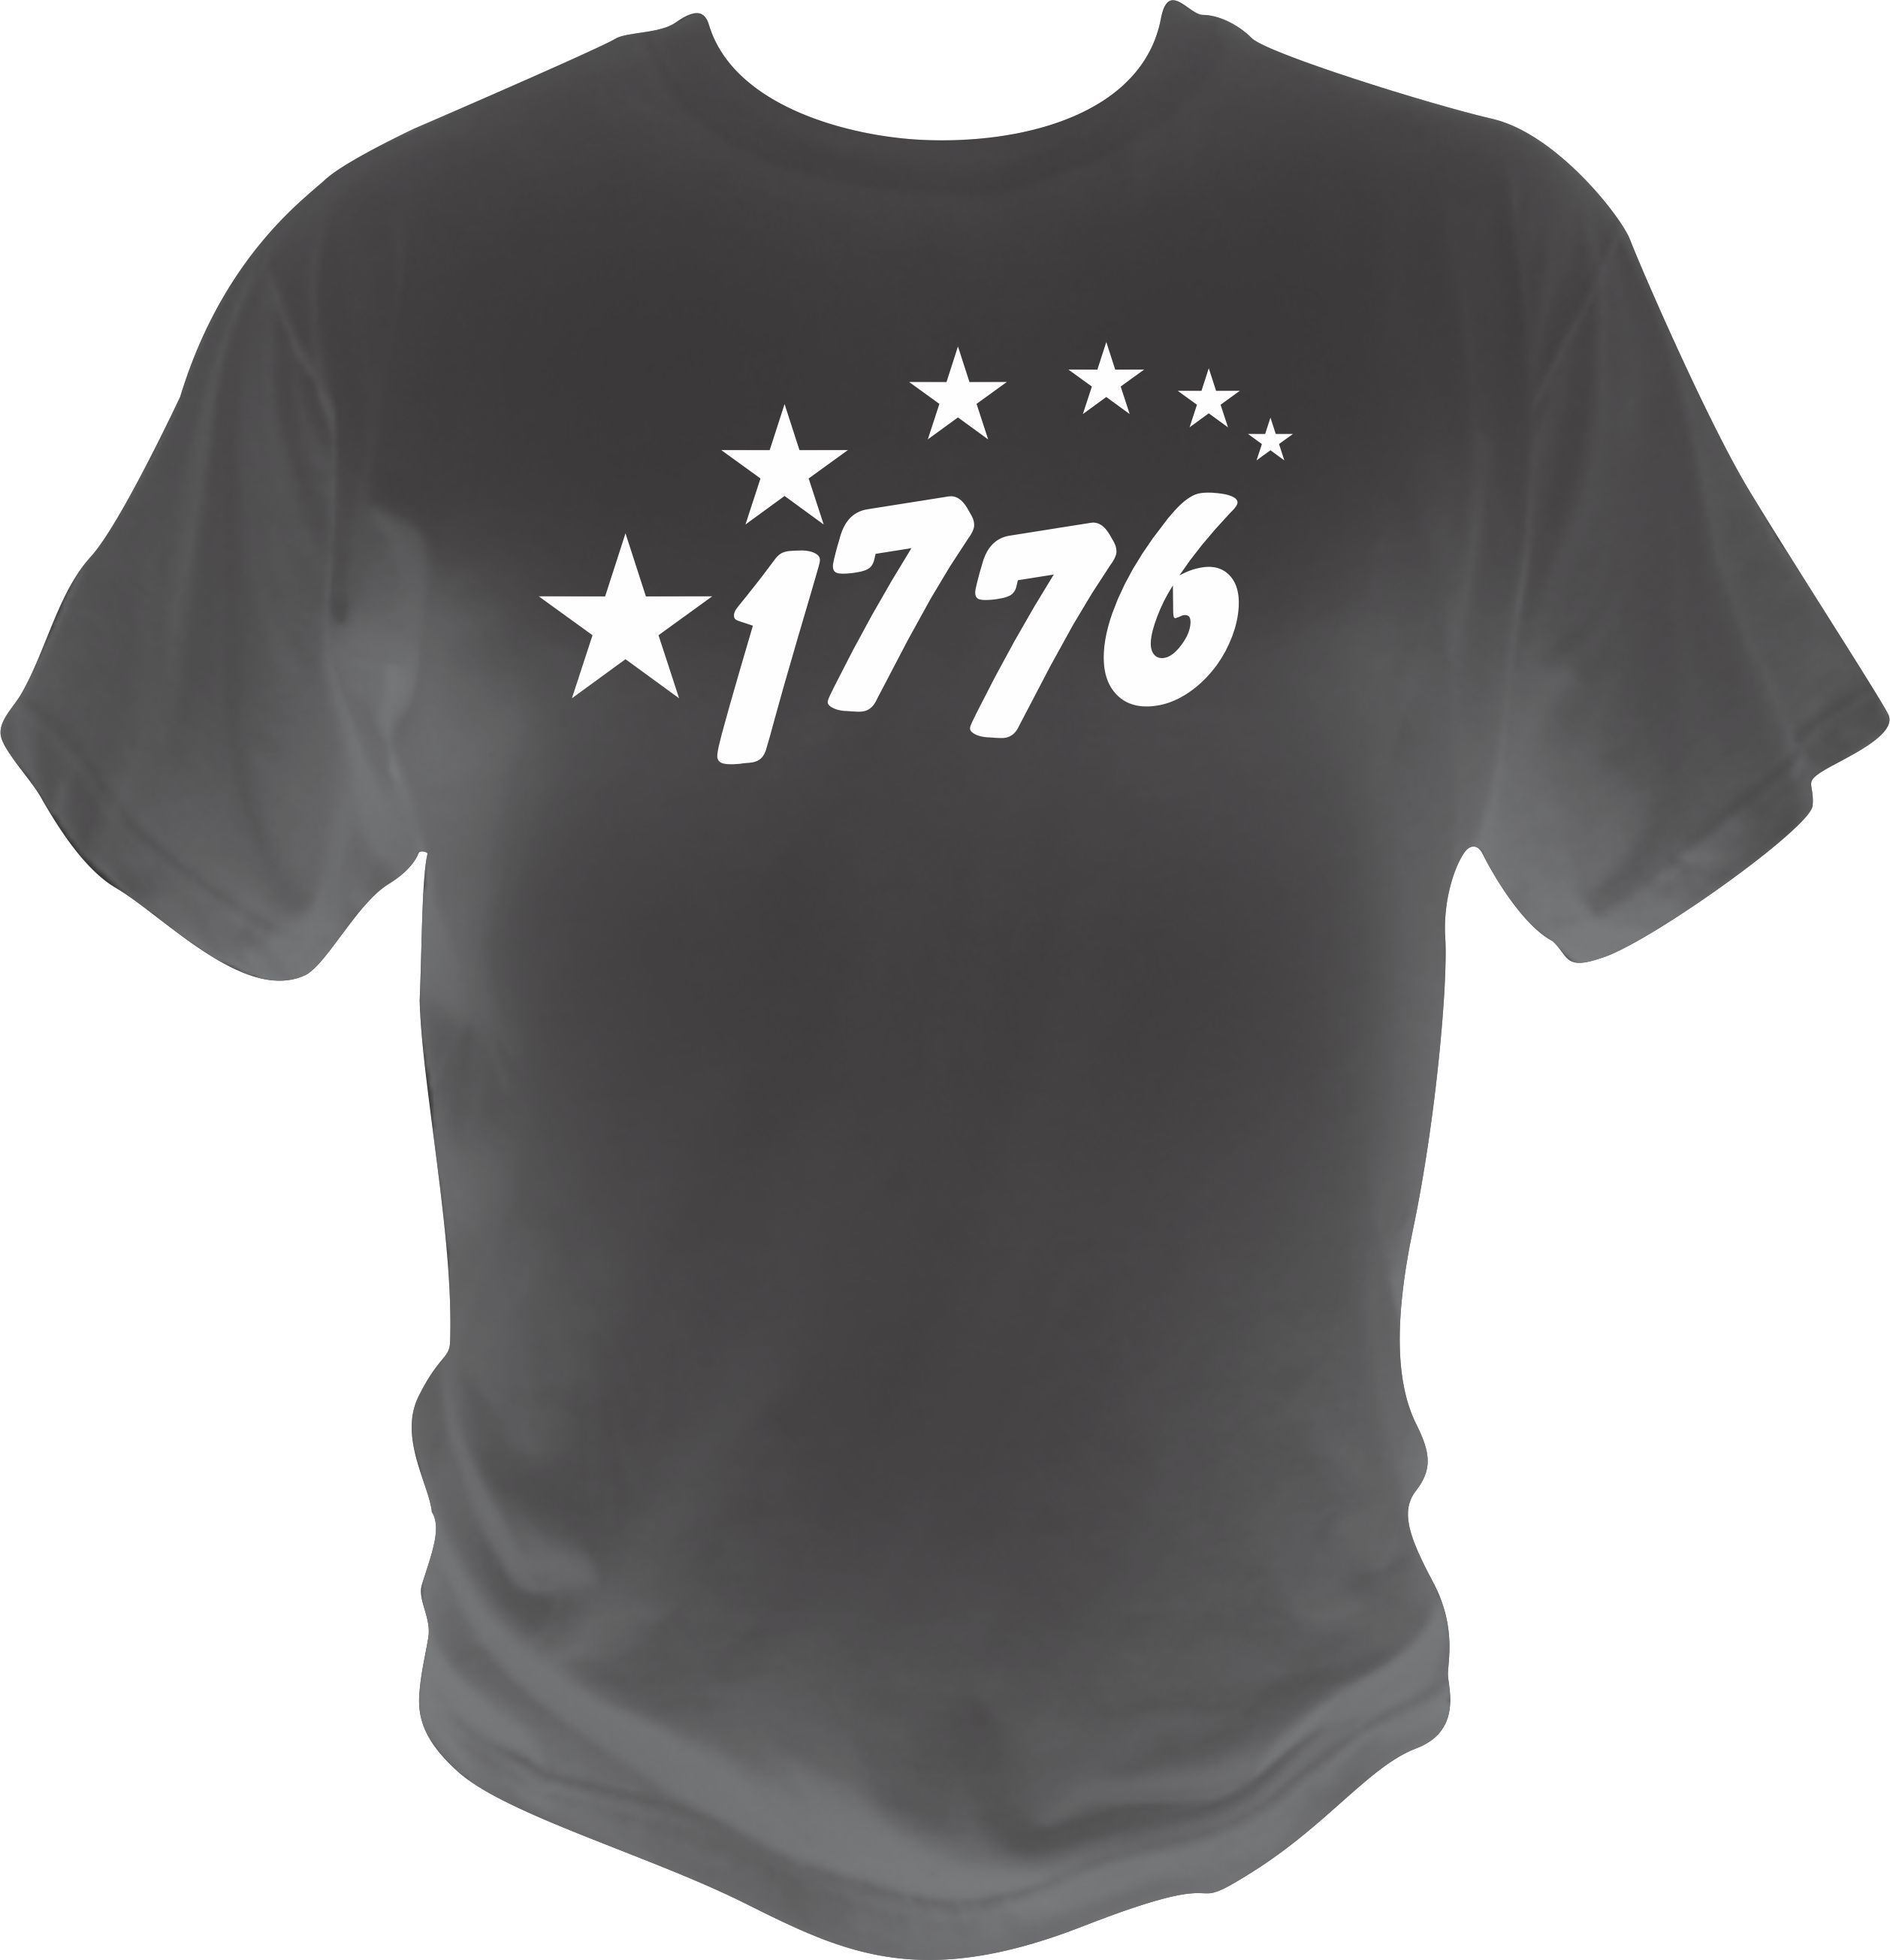 America 1776 shirt